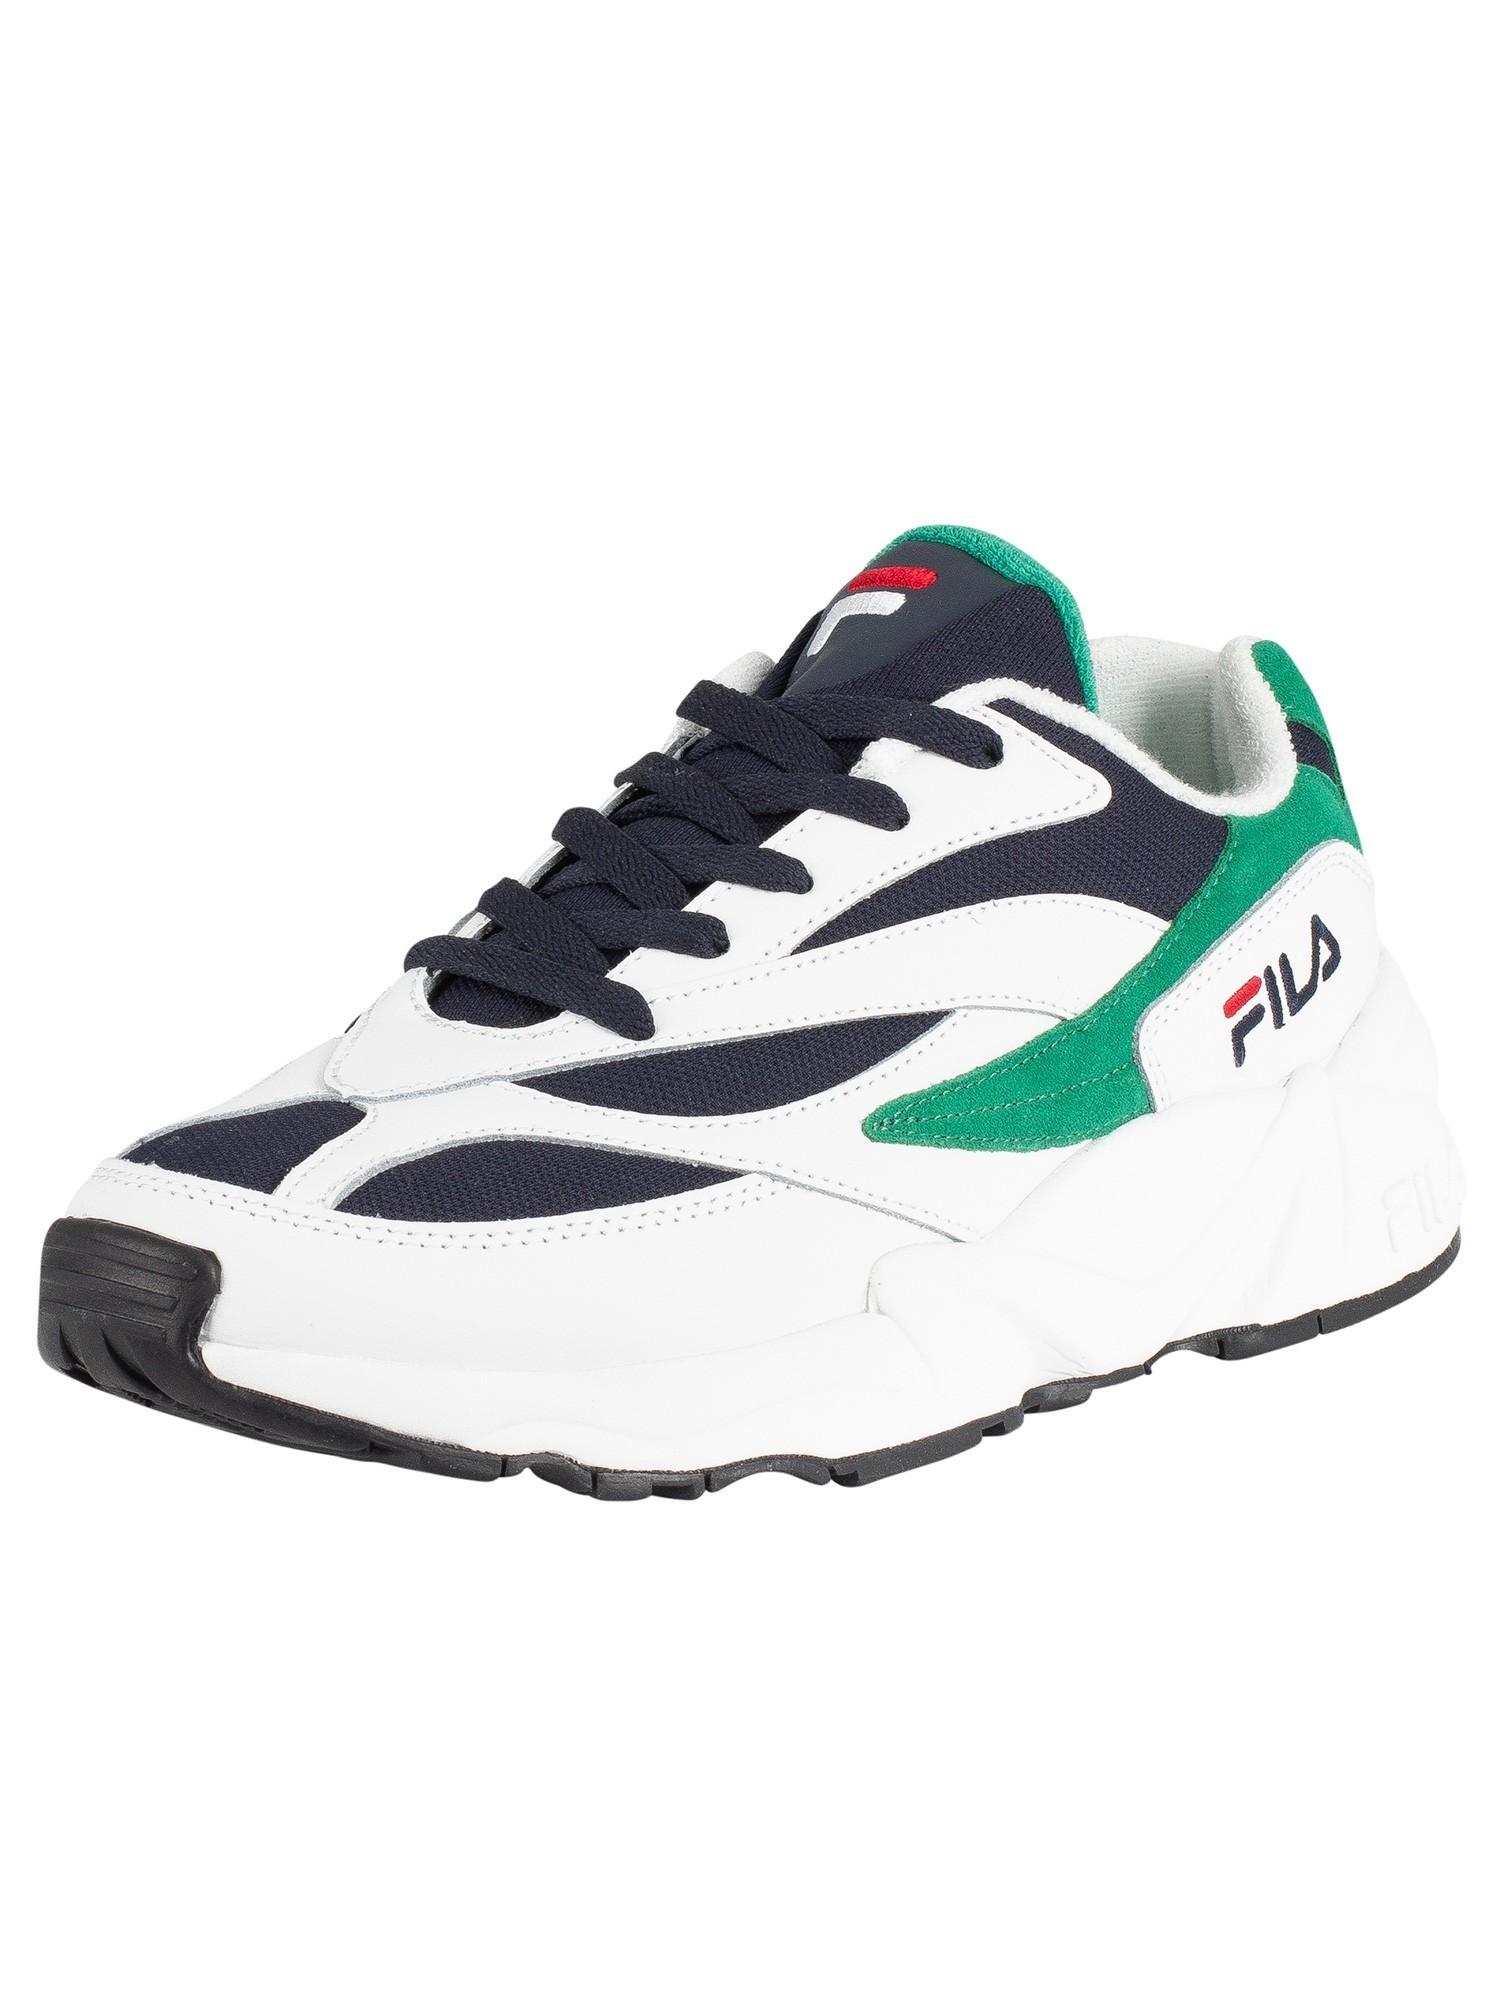 Fila V94M Low Trainers - White/Navy/Shady Glade